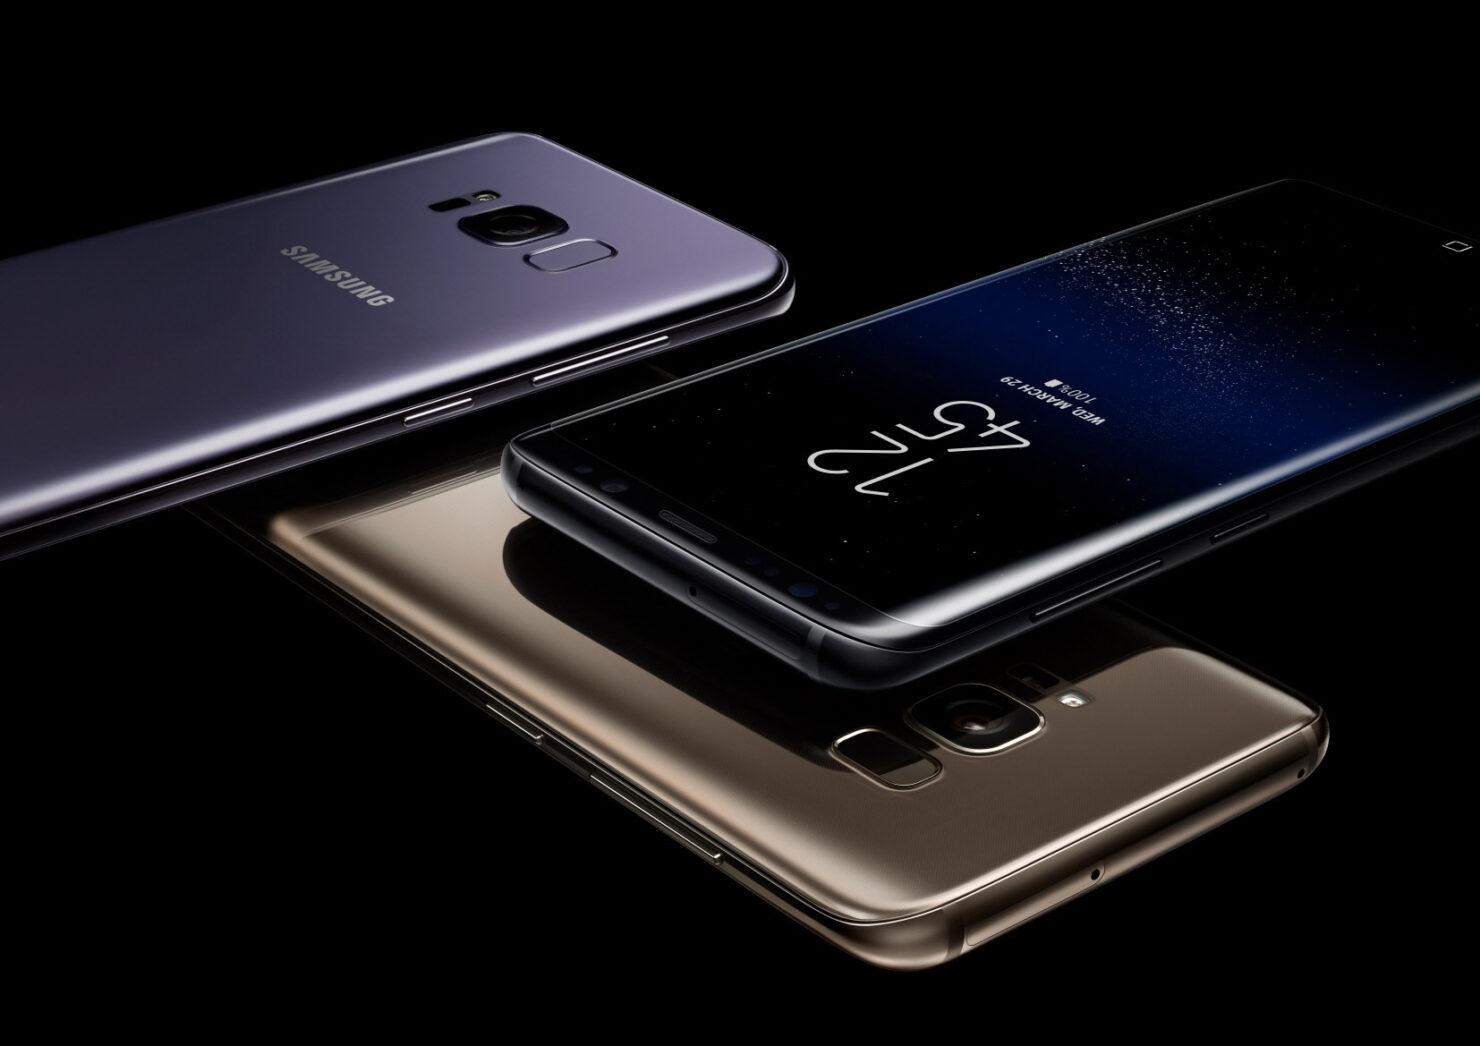 Galaxy S8 Dual SIM Factory Unlocked Variants Costs Less Than $500